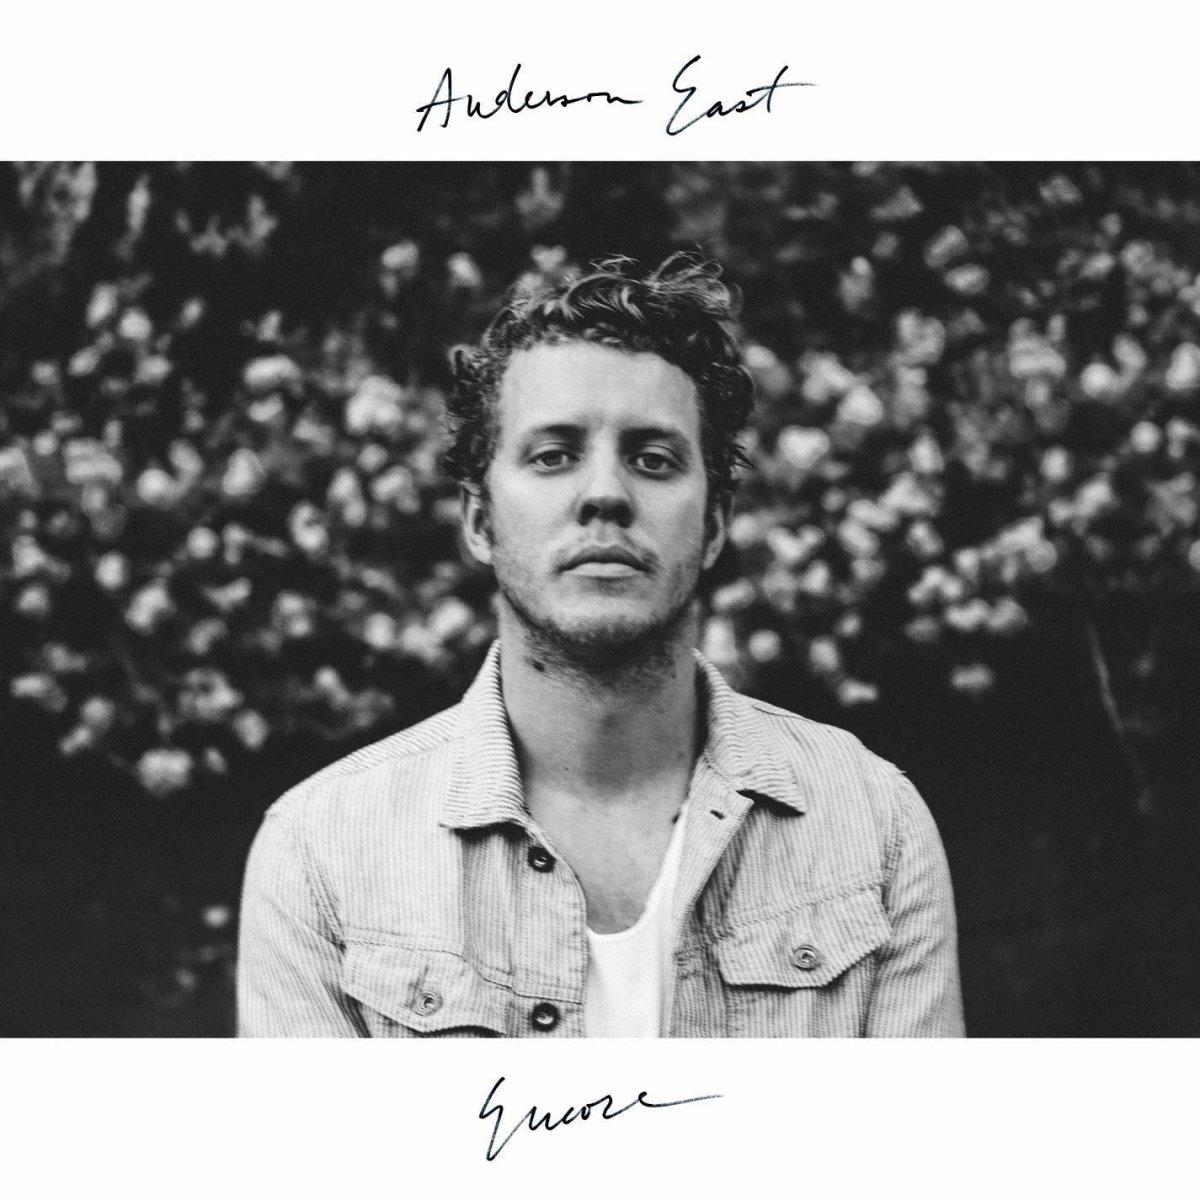 Anderson East - Encore